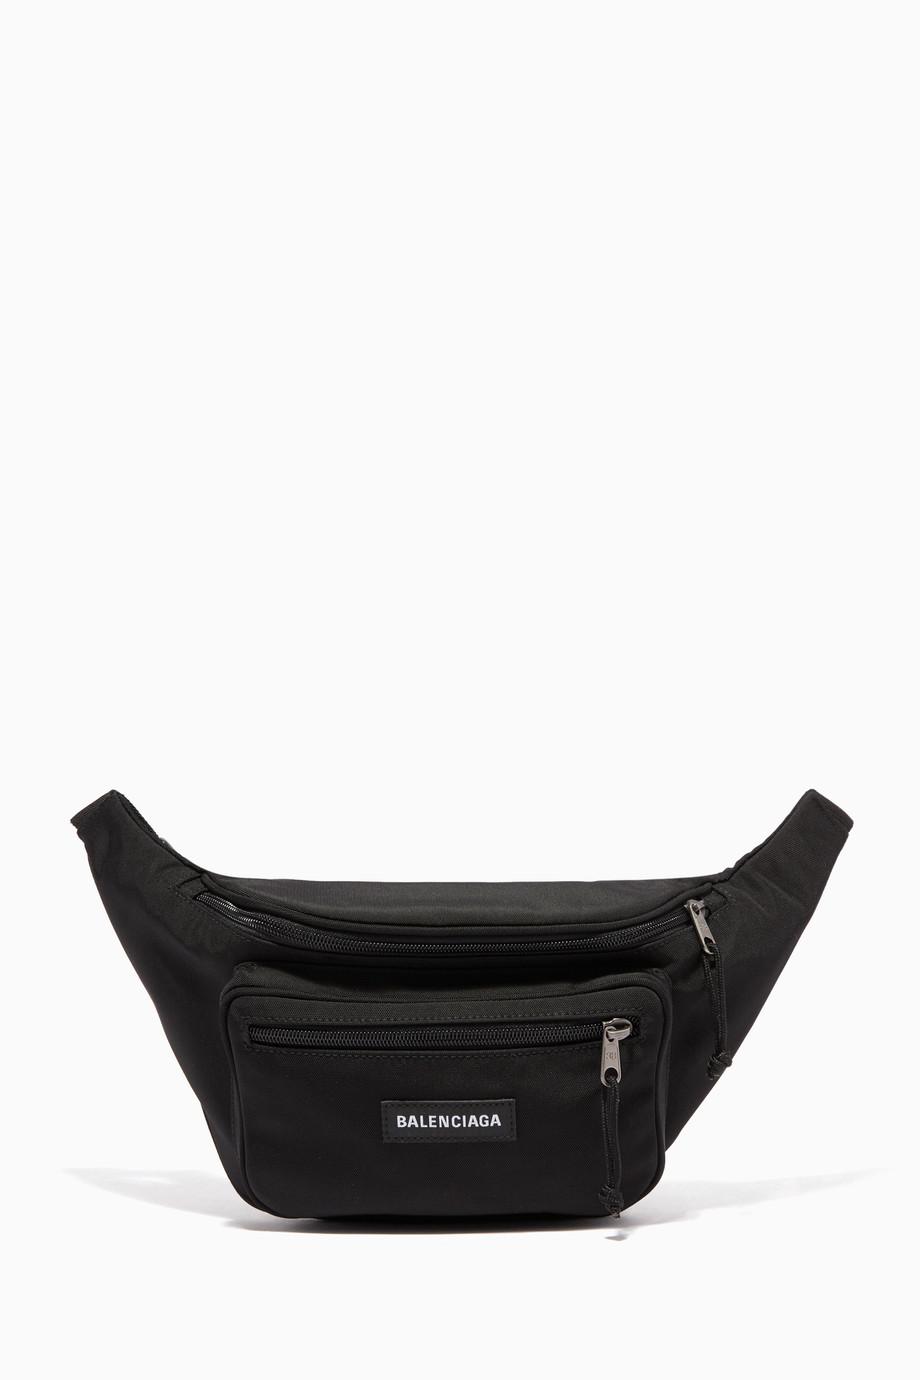 58a95548db8 Shop Balenciaga Black Black Explorer Logo Belt Bag for Men | Ounass Oman